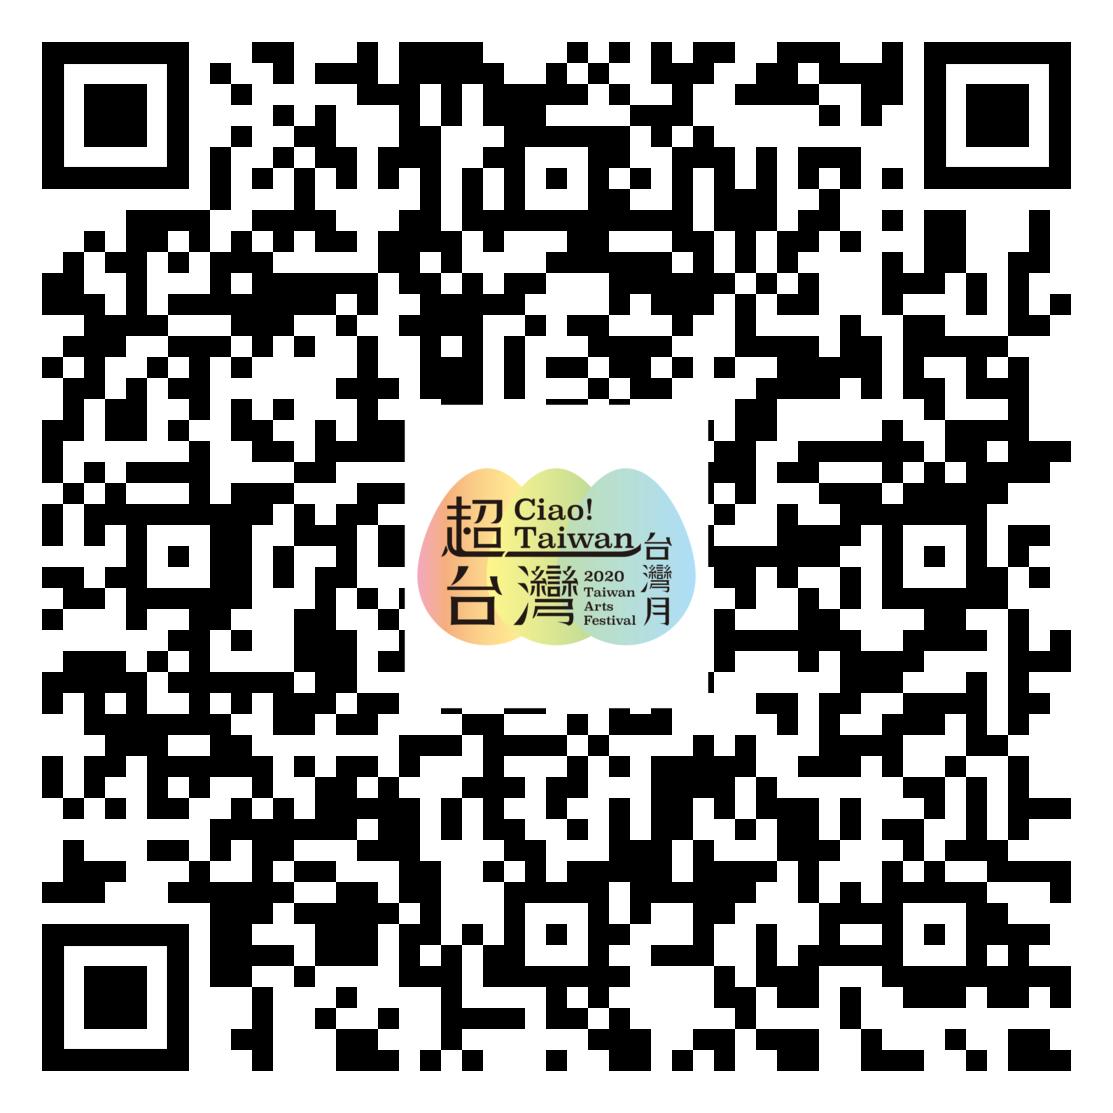 qr-code-media-kit.png